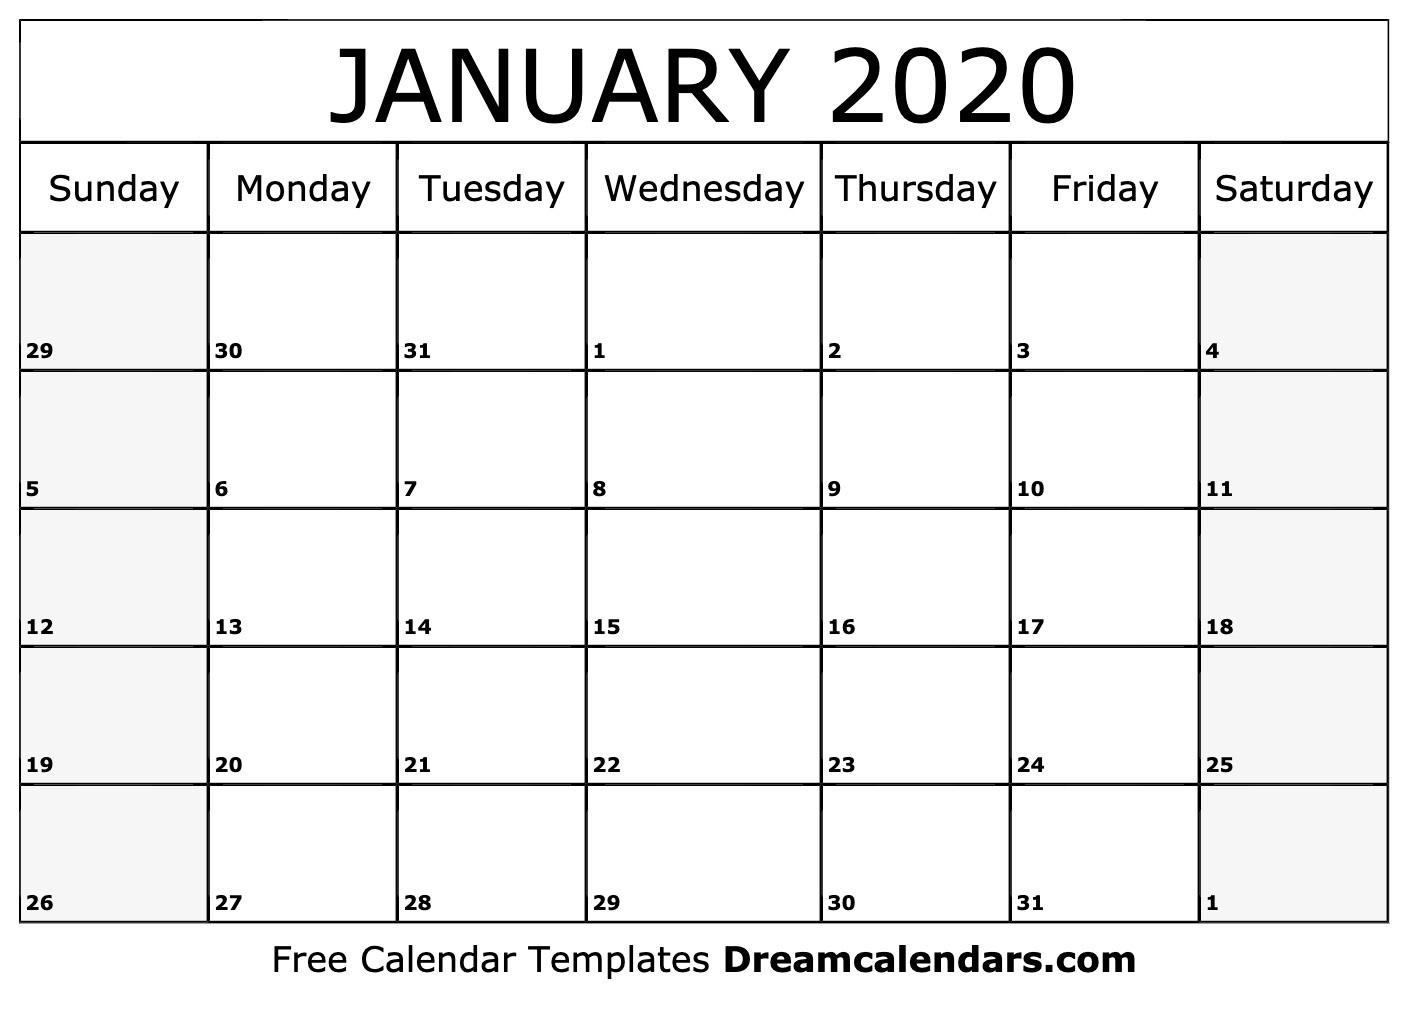 Printable January 2020 Calendar-Calendar Of January 2020